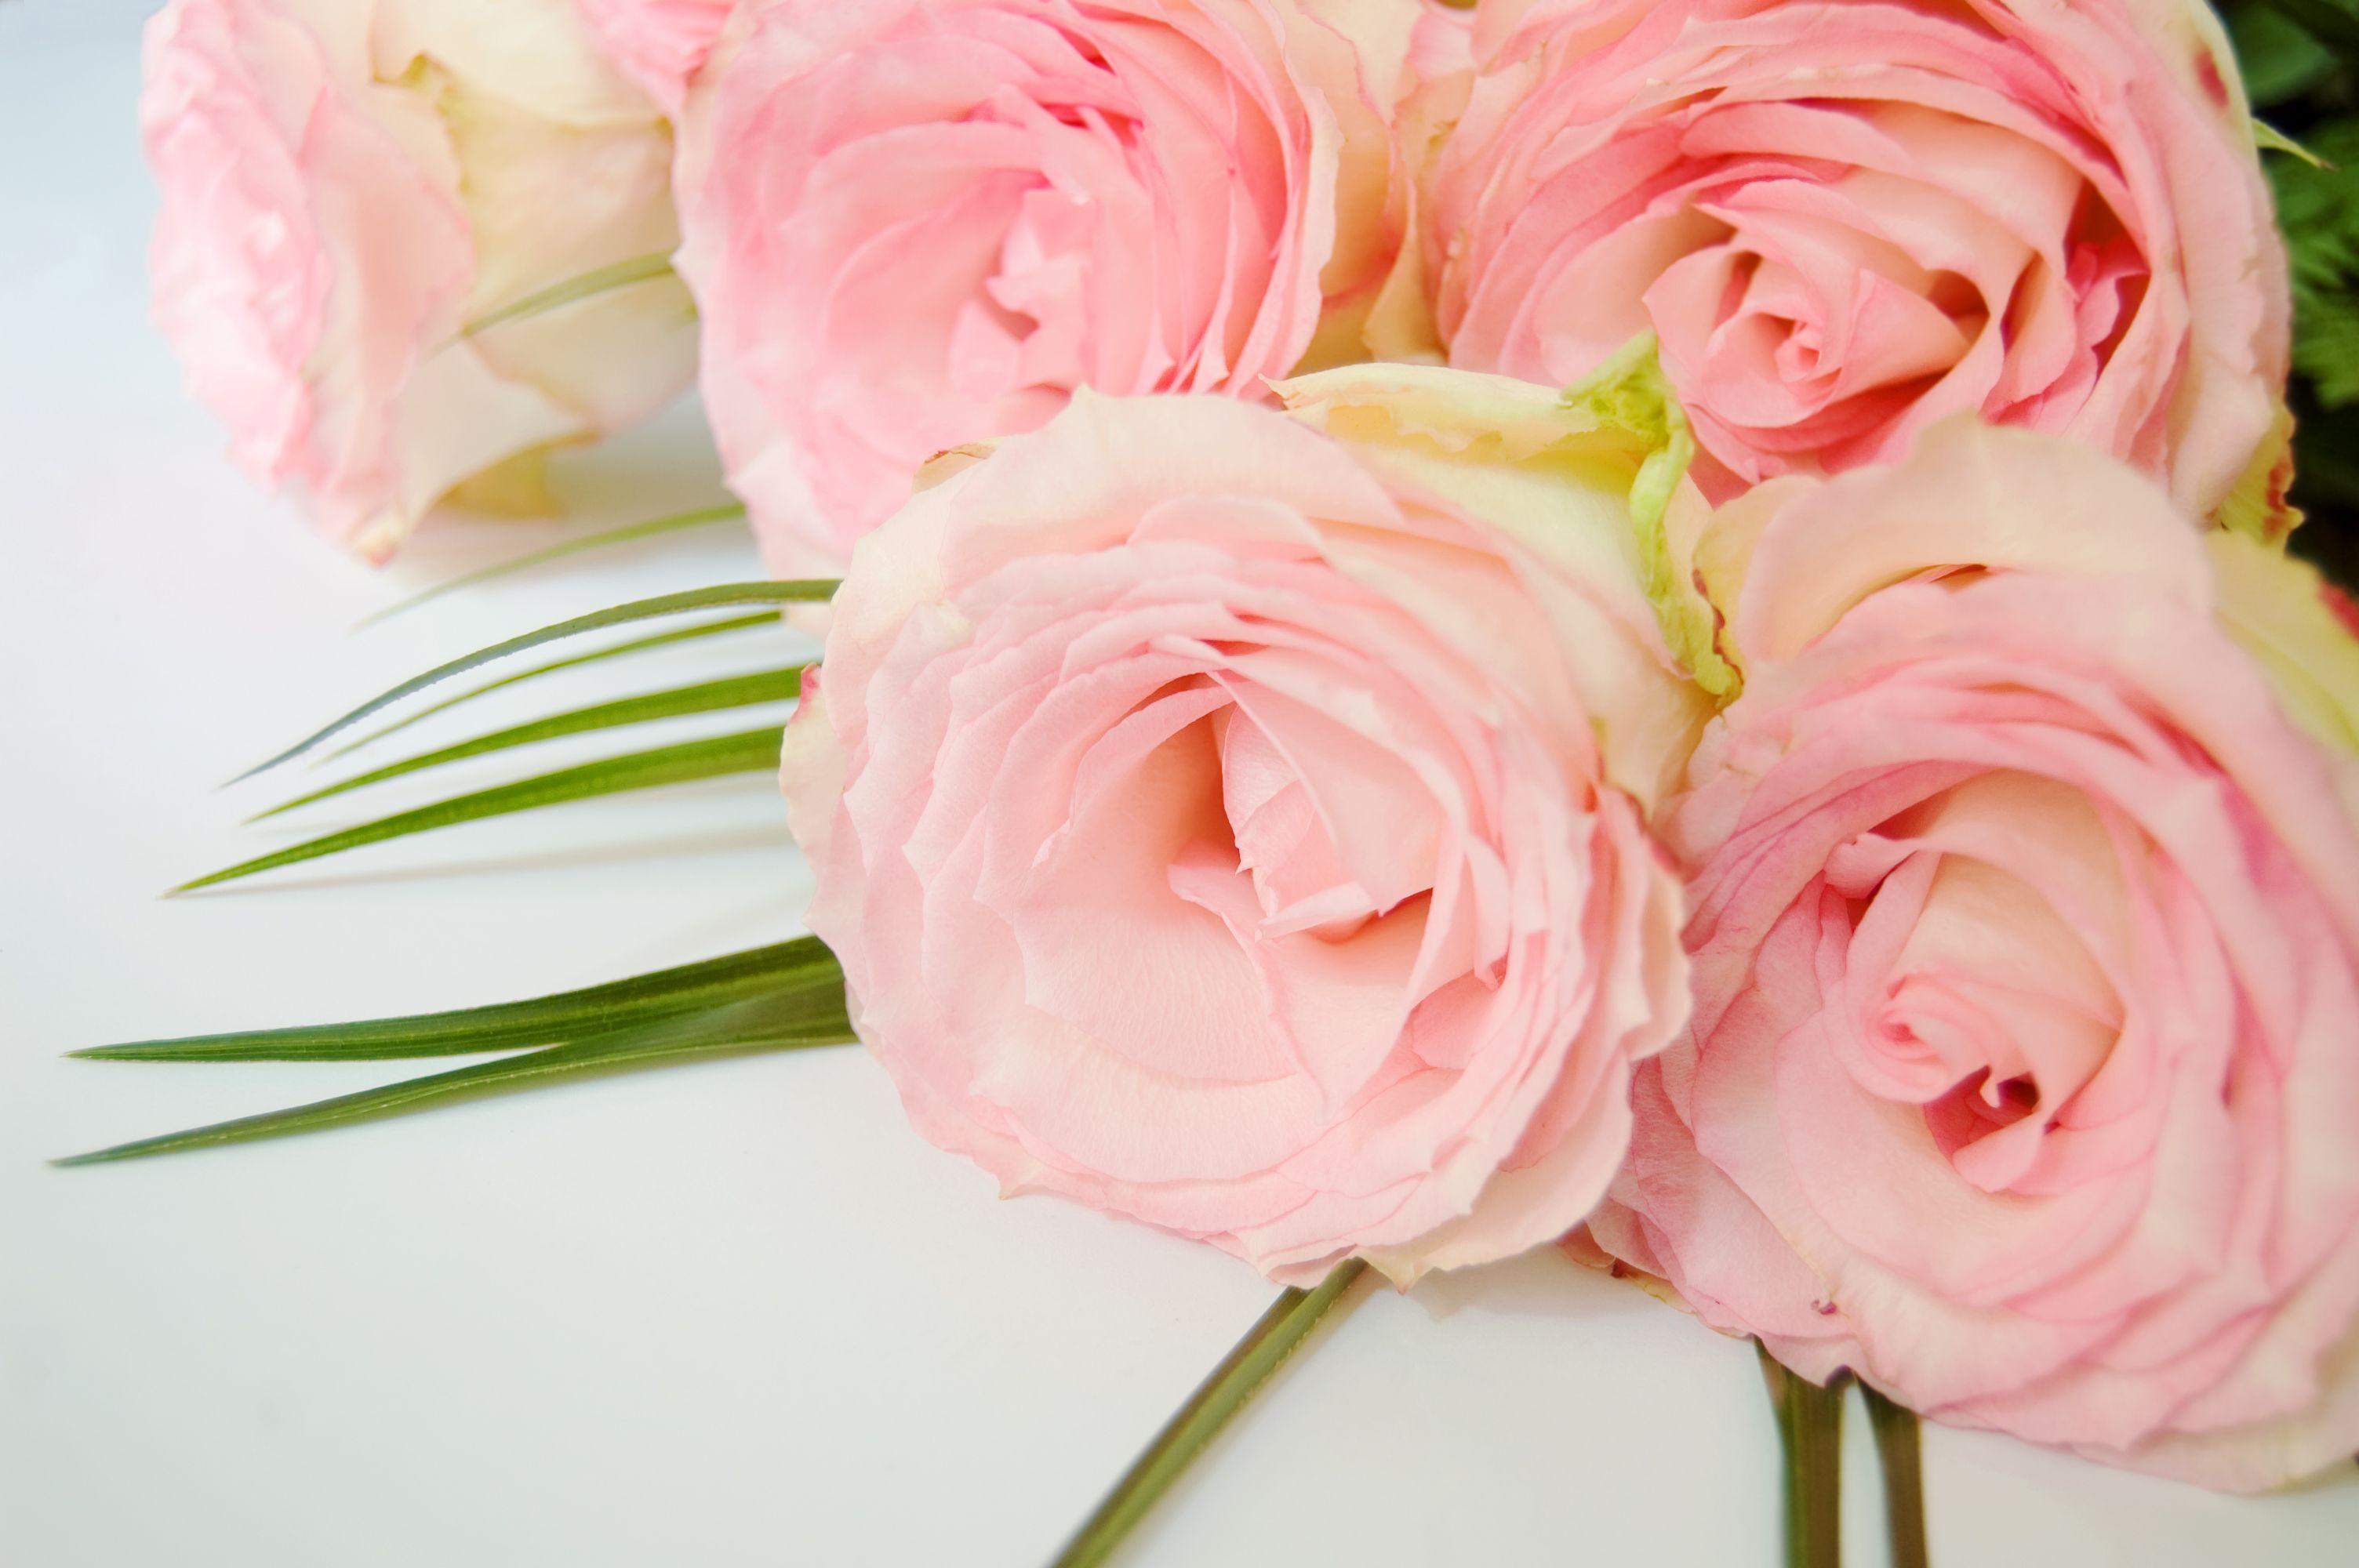 roses_10804802